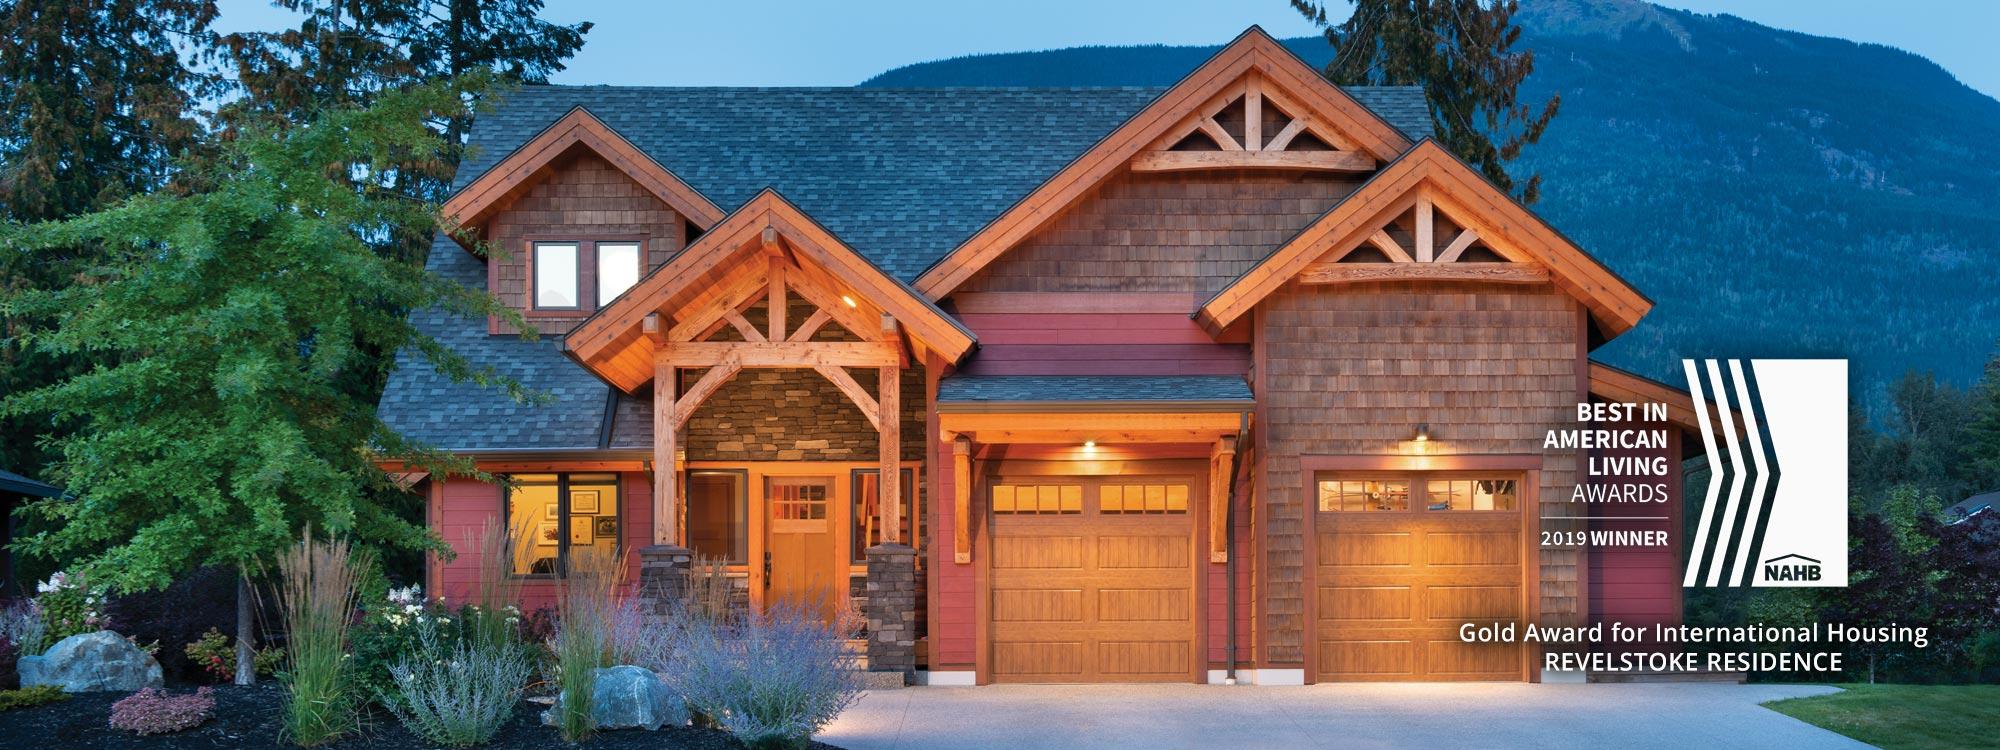 Riverbend Timber Frame Homes - Timber home design award